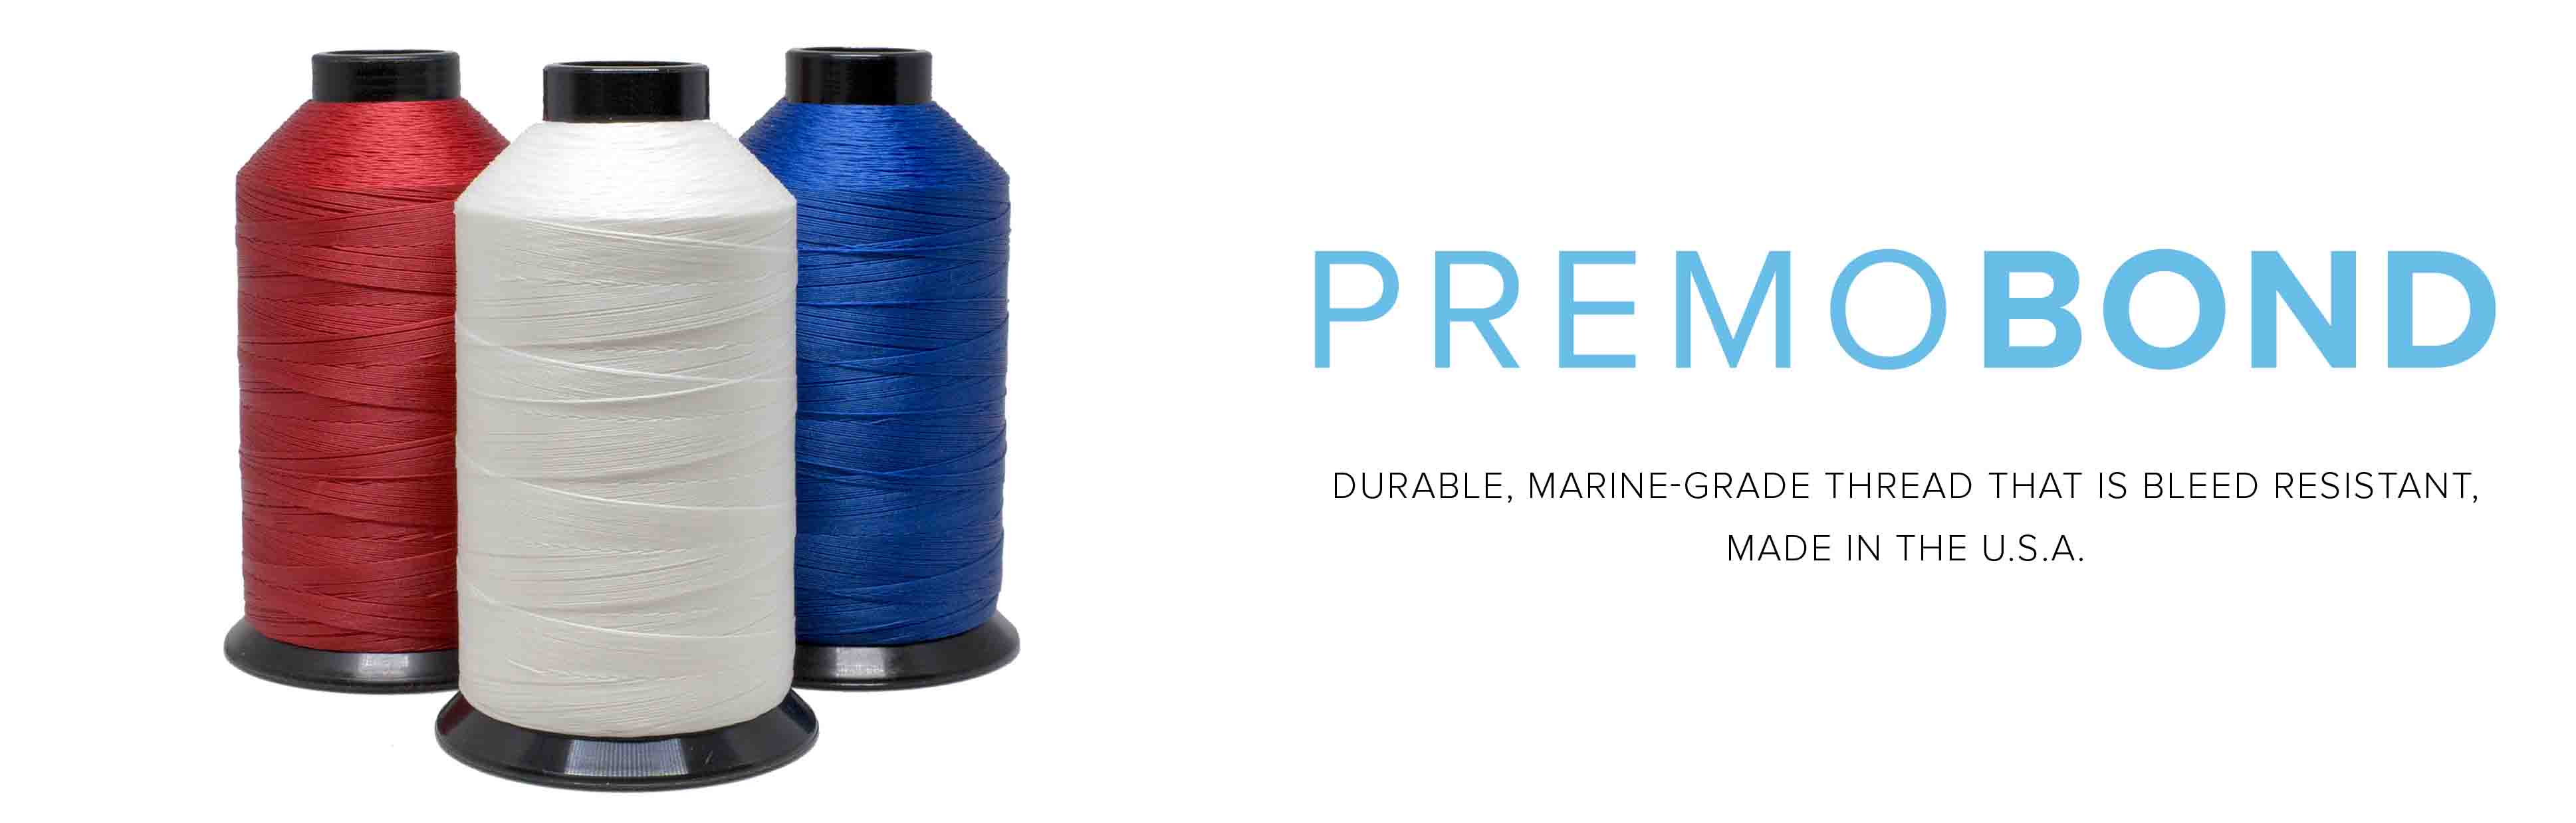 PremoBond thread bobbins advertisement